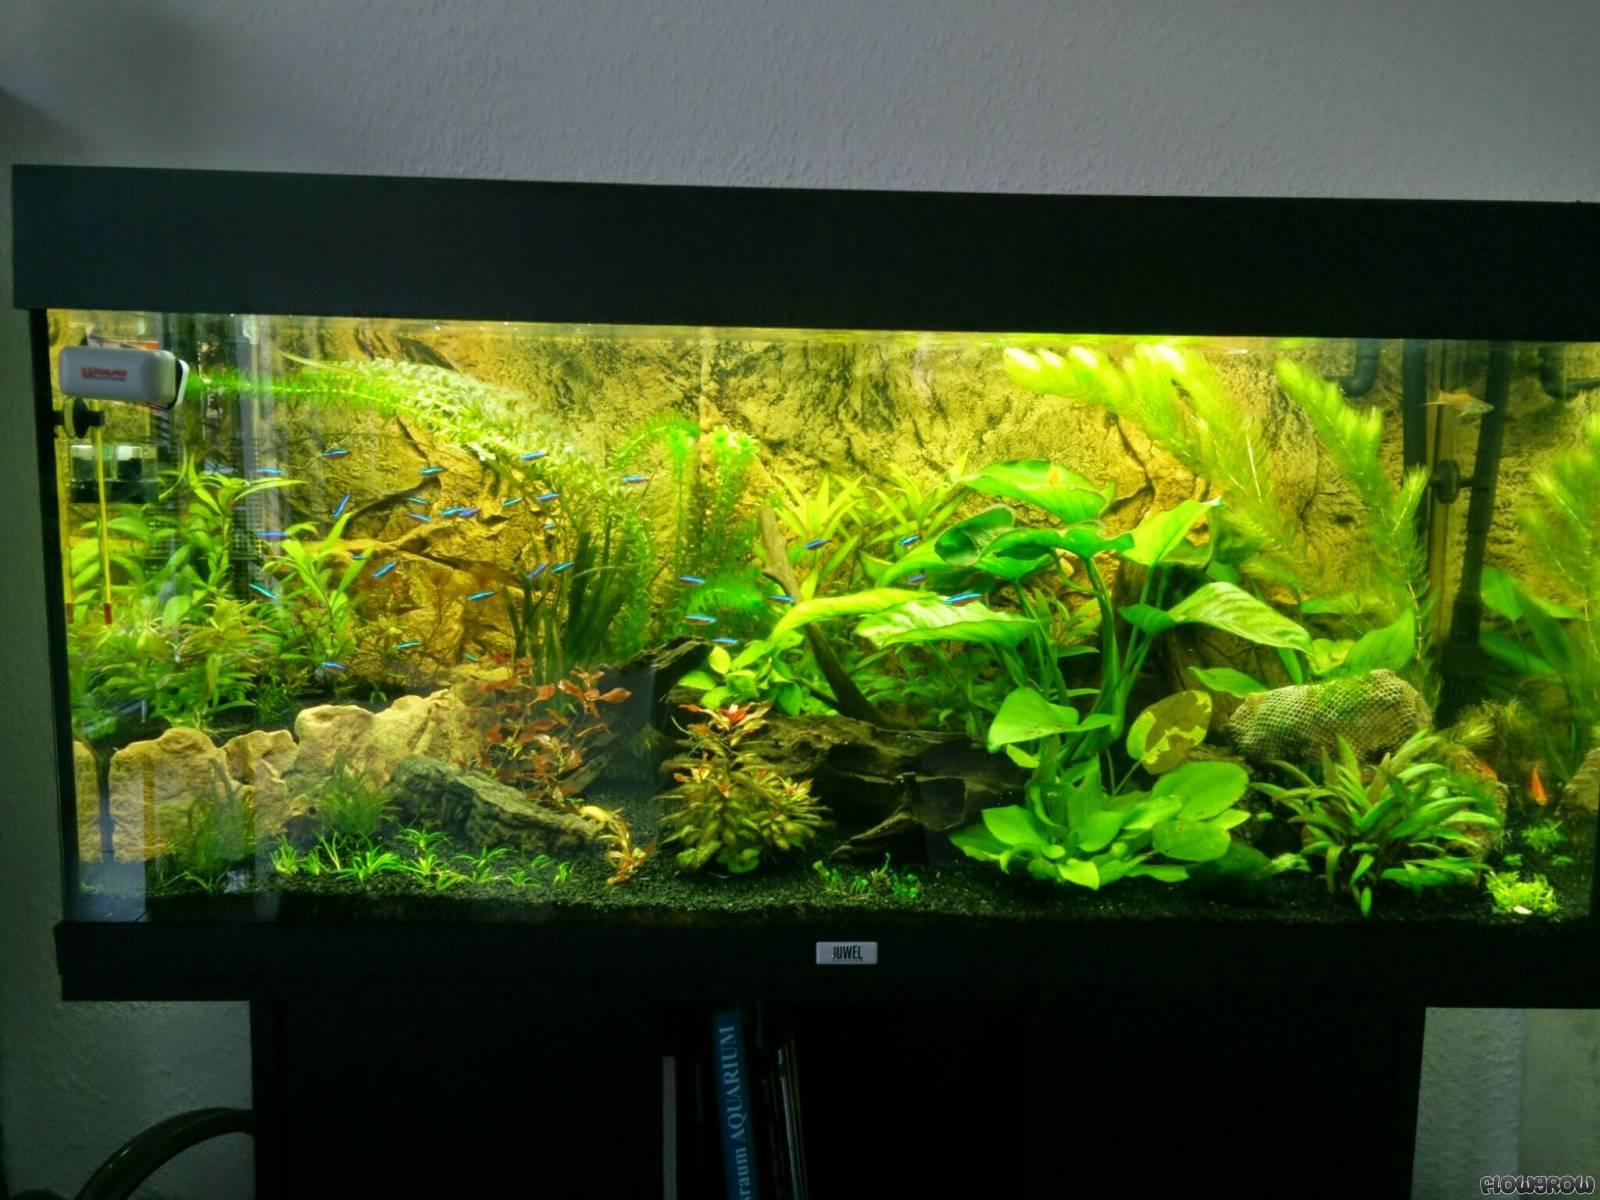 einsteiger 180 l flowgrow aquascape aquarien datenbank. Black Bedroom Furniture Sets. Home Design Ideas